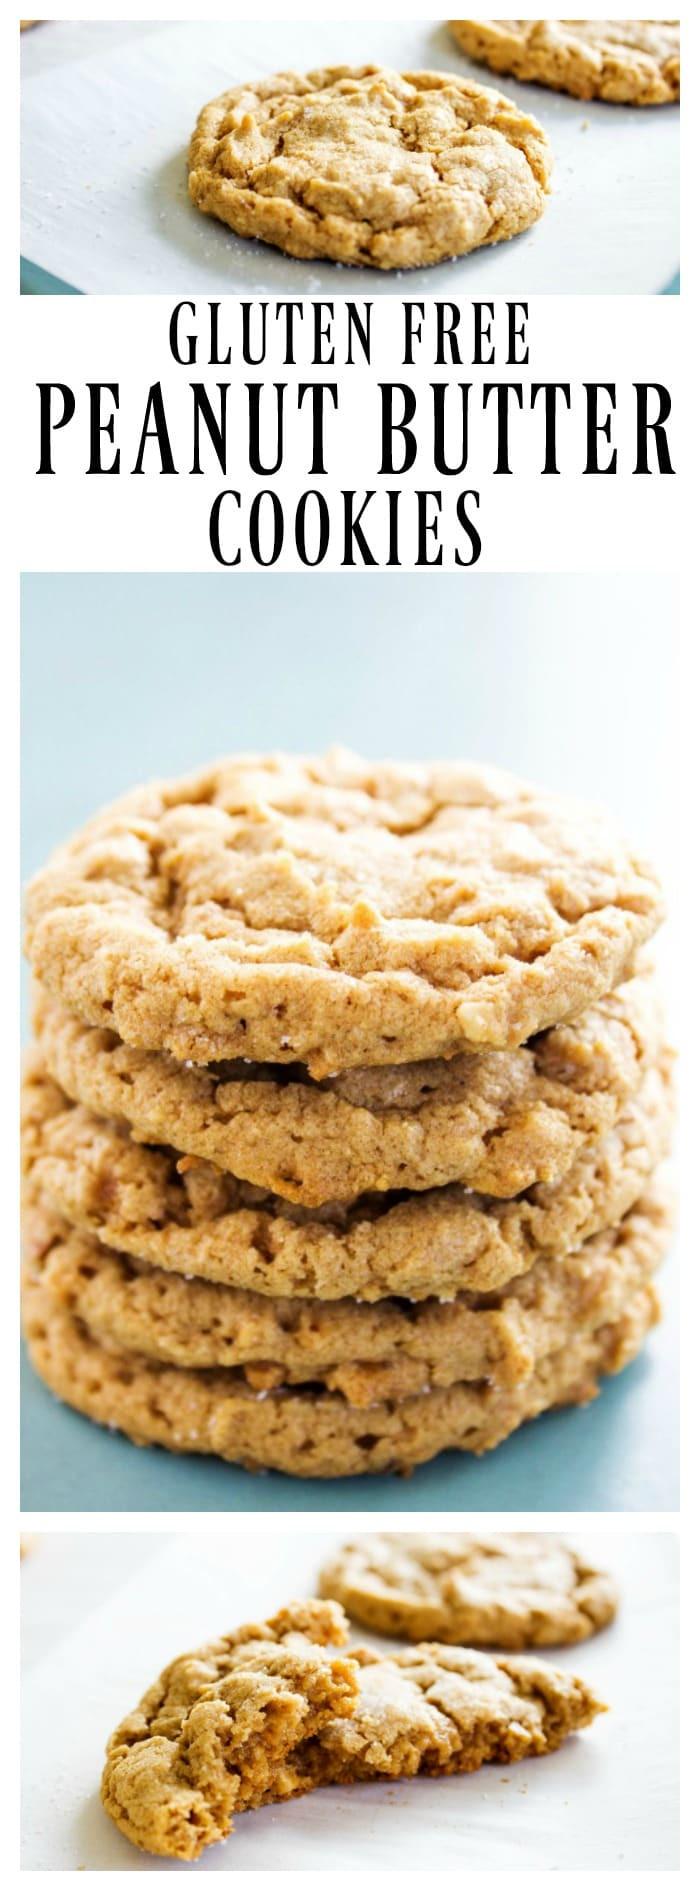 Gluten Free Peanut Butter Cookies  GLUTEN FREE PEANUT BUTTER COOKIES A Dash of Sanity